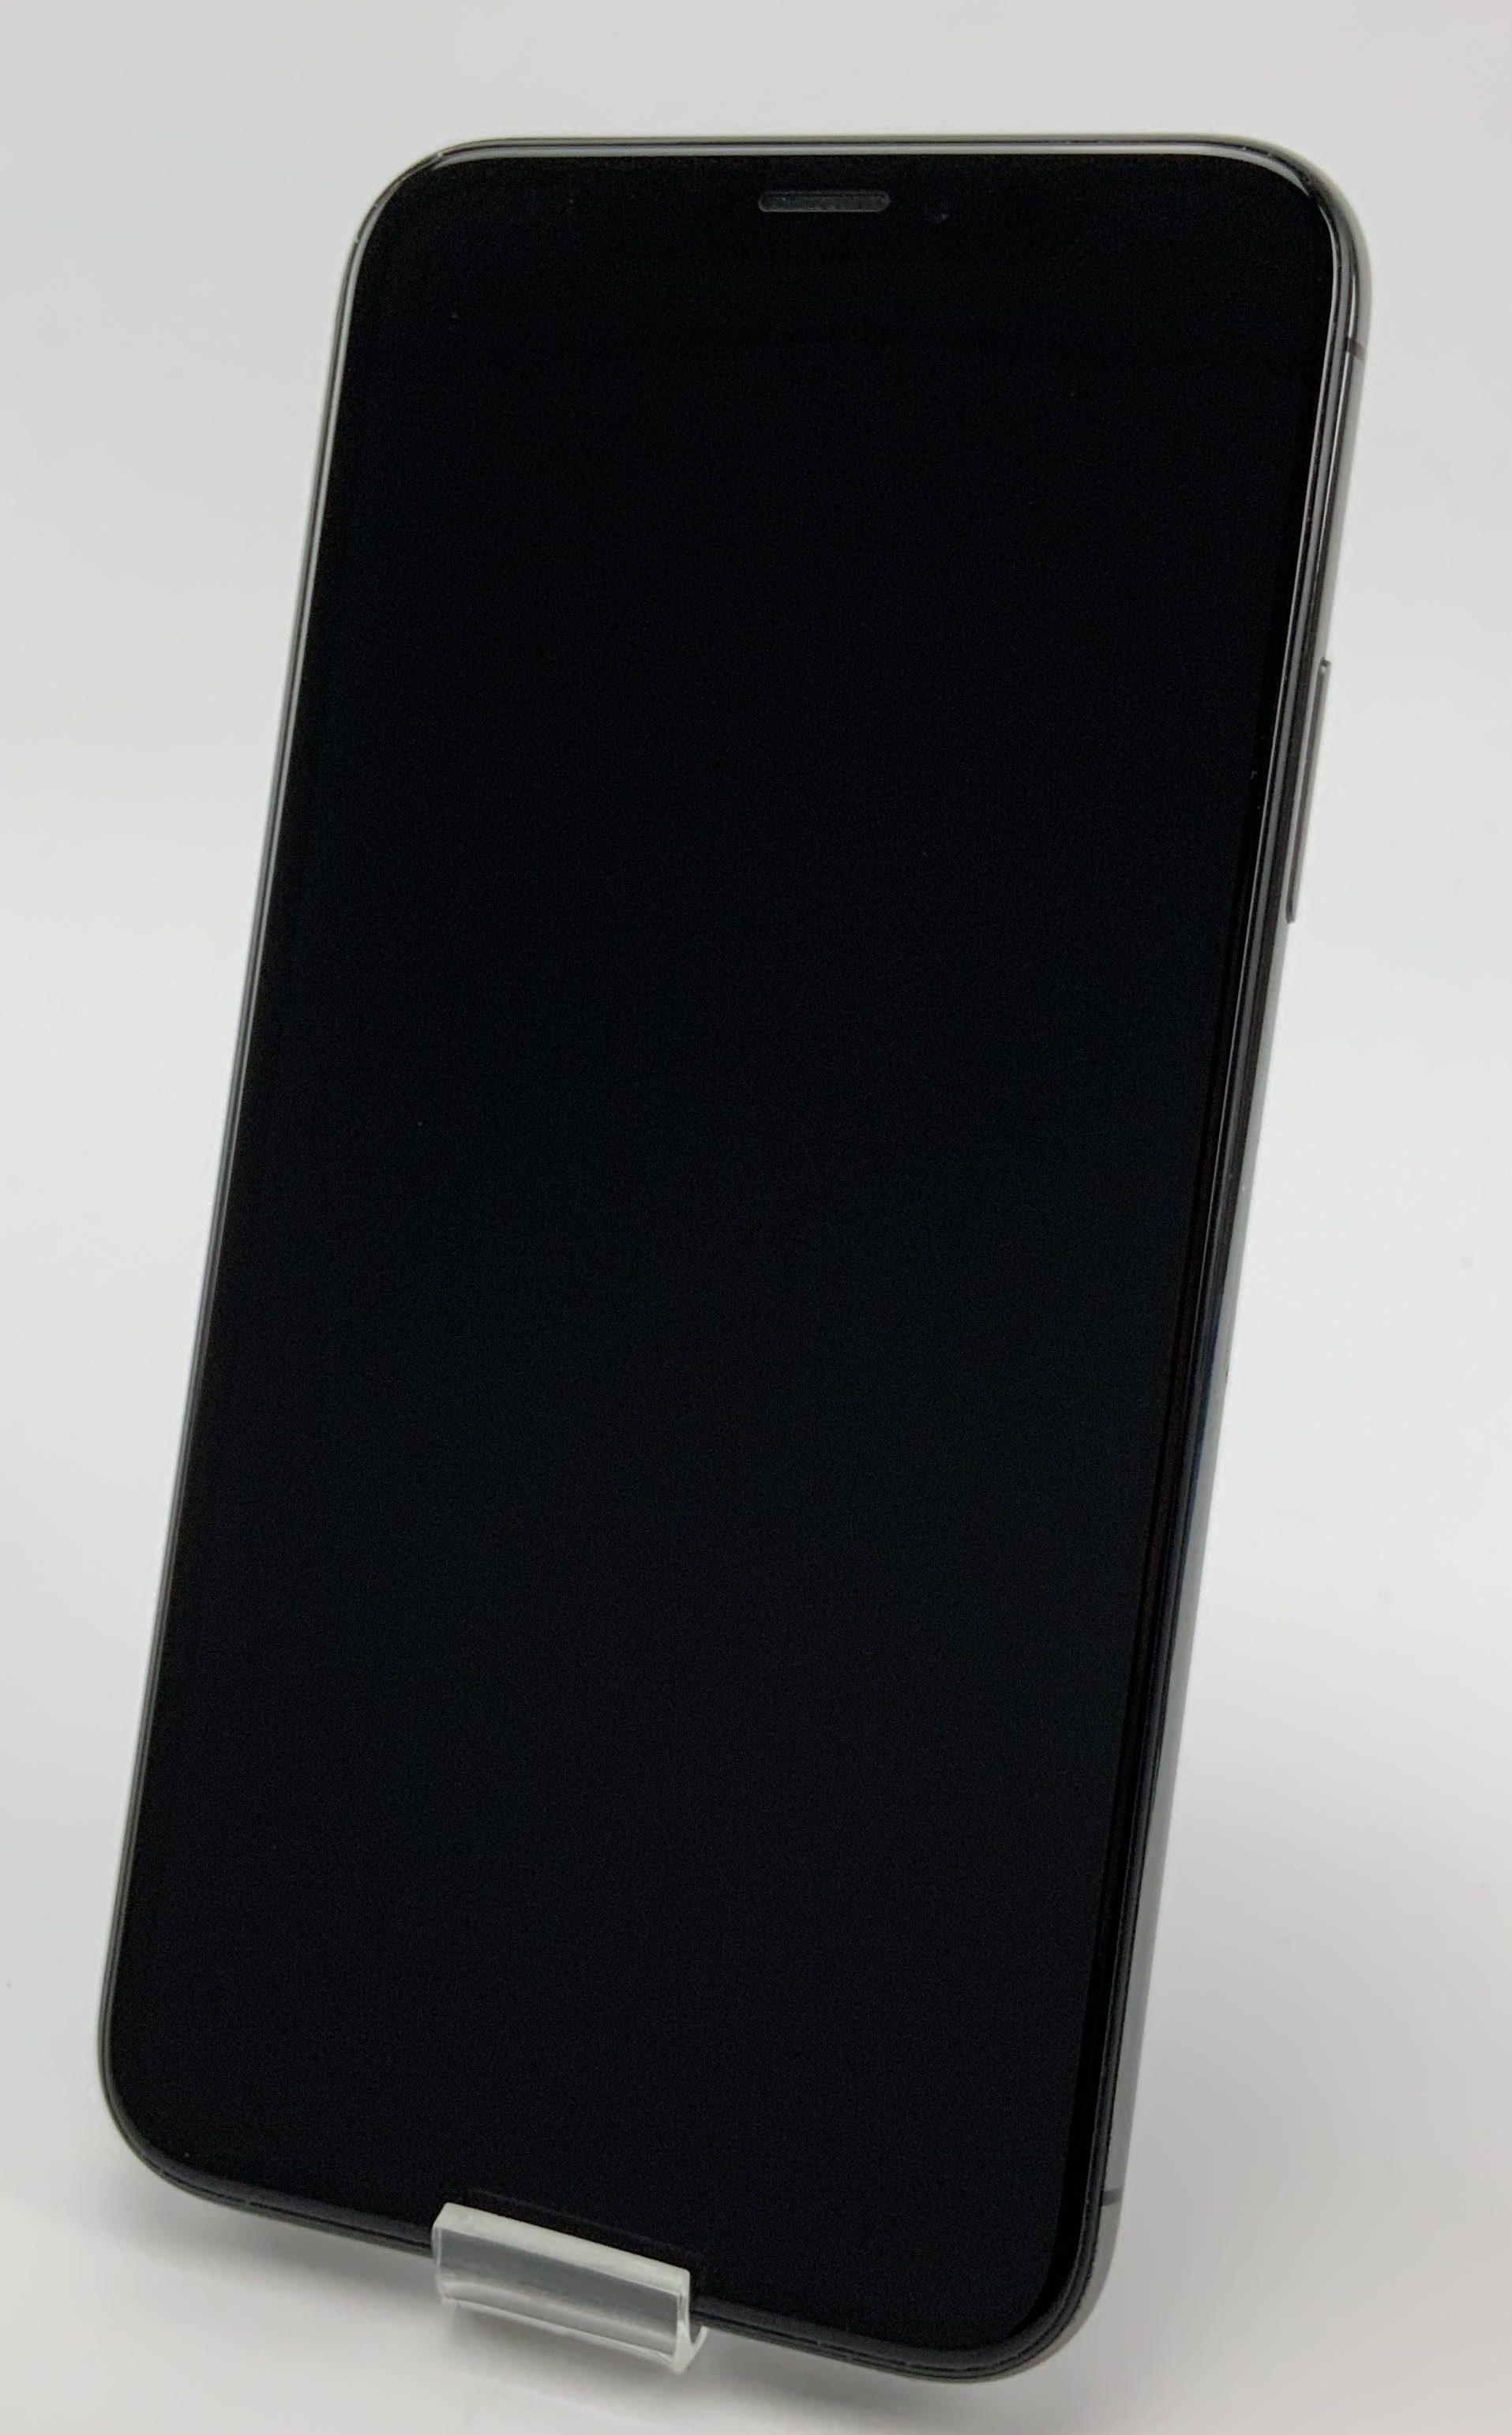 iPhone X 256GB, 256GB, Space Gray, obraz 1